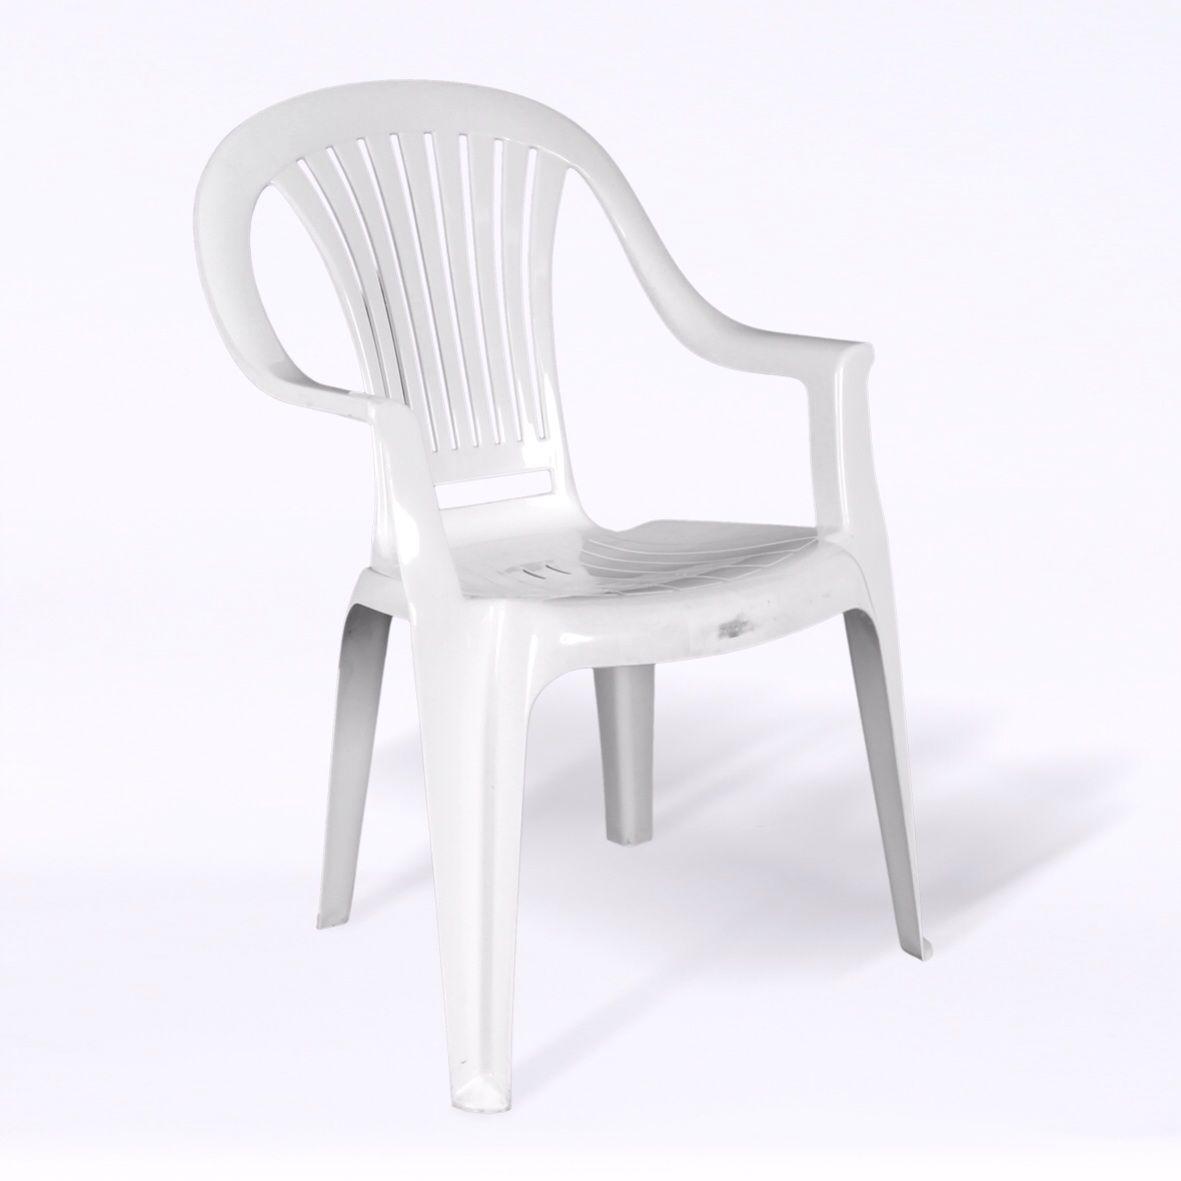 Stylish Plastic Garden Chairs in 3  Plastic garden chairs